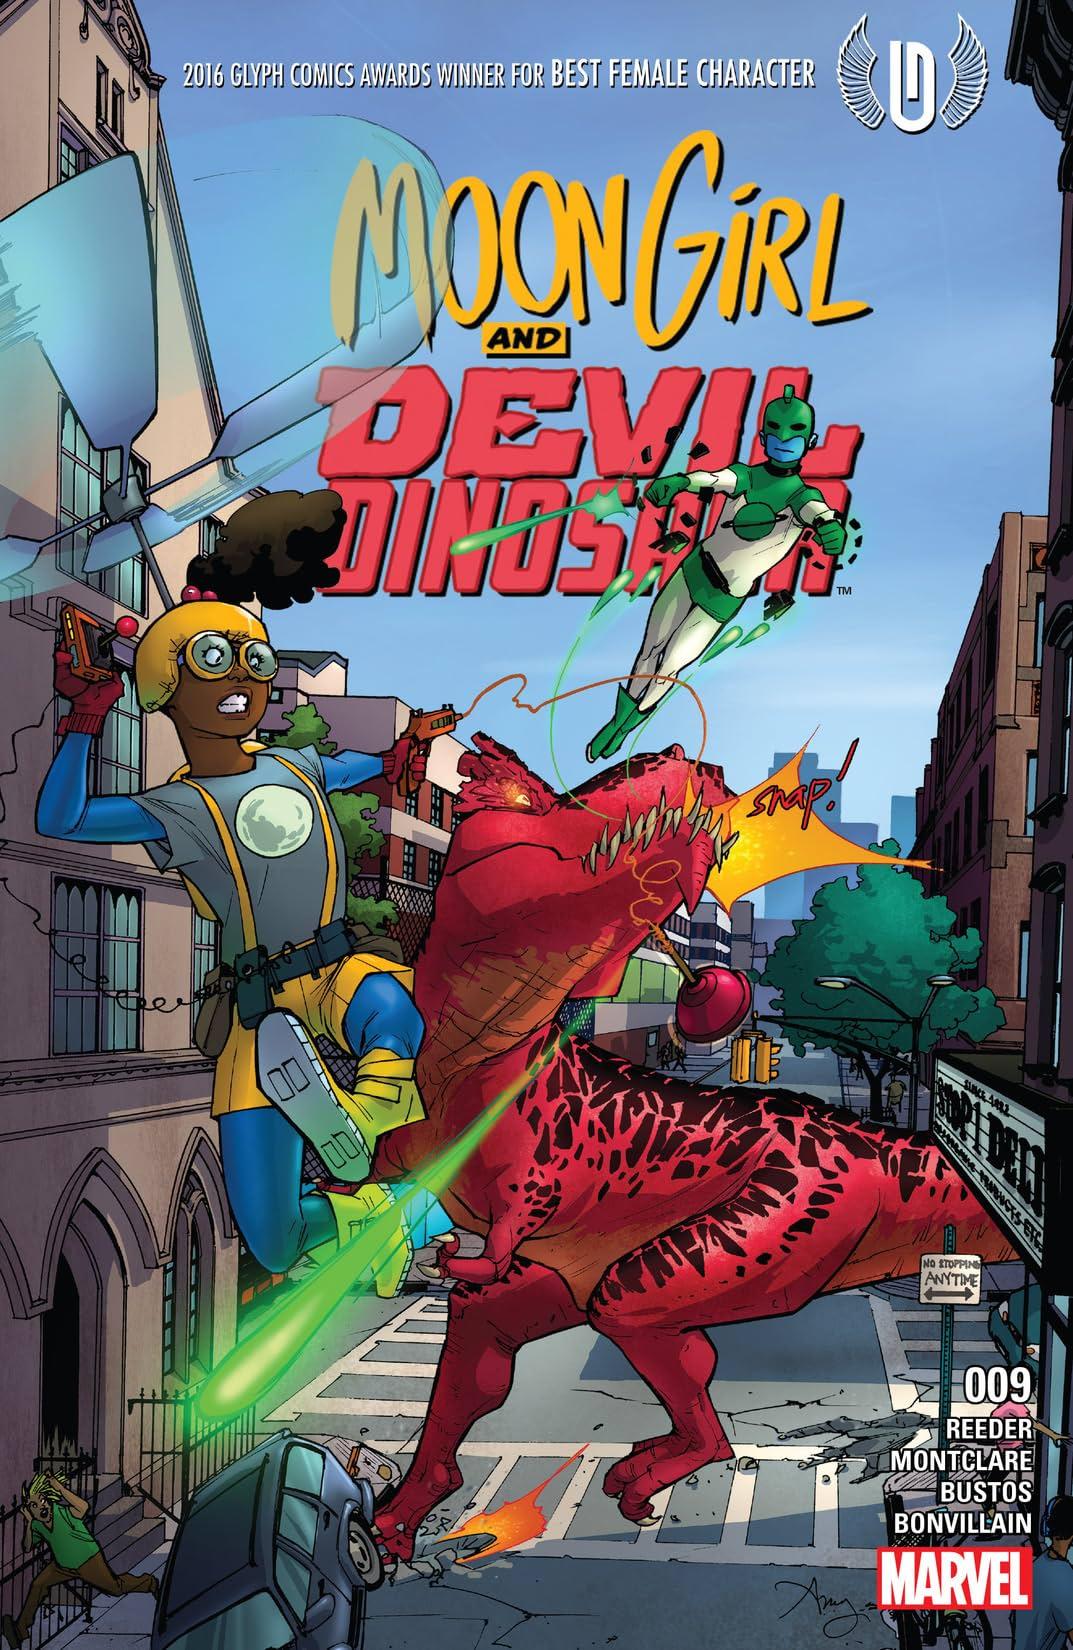 Moon Girl and Devil Dinosaur (2015-2019) #9